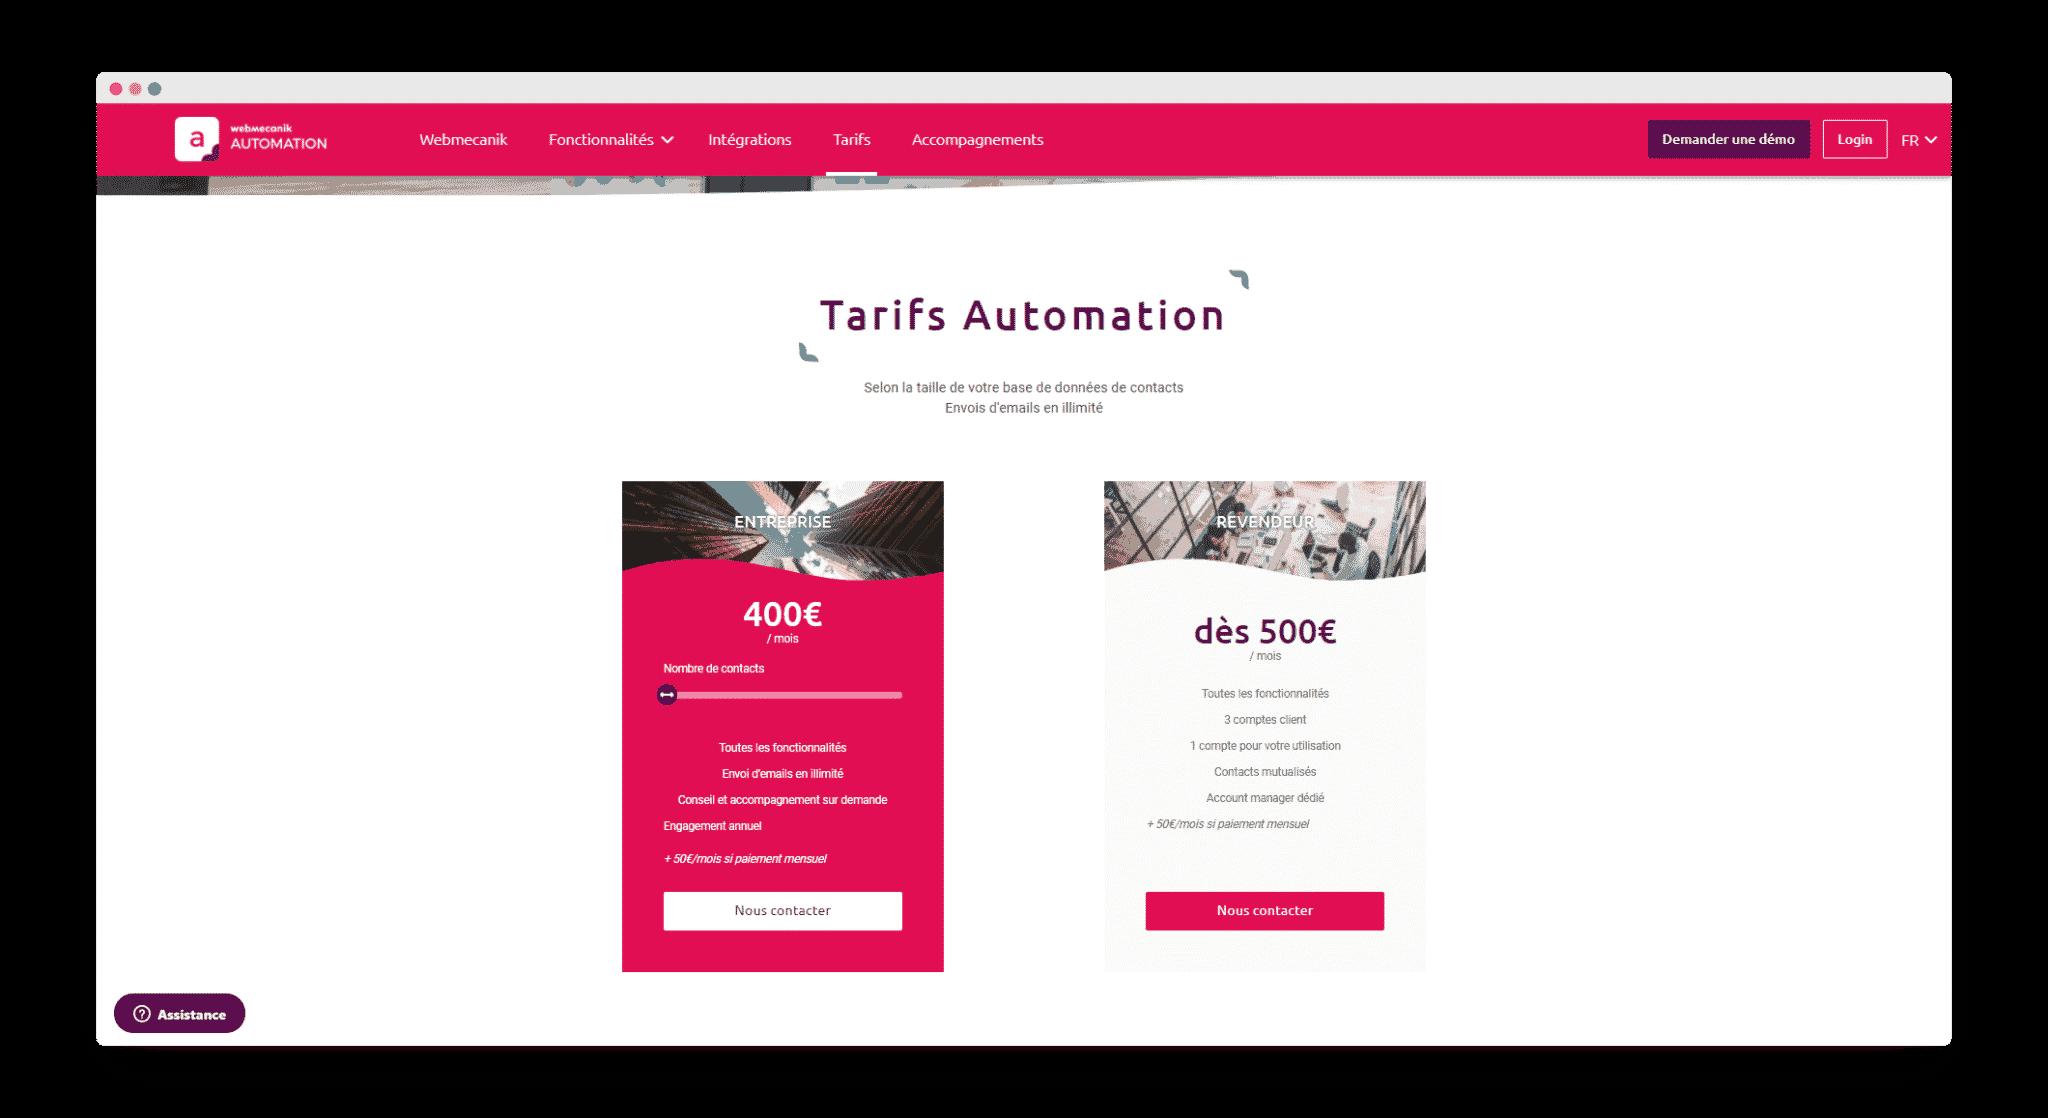 Webmecanik tarifs